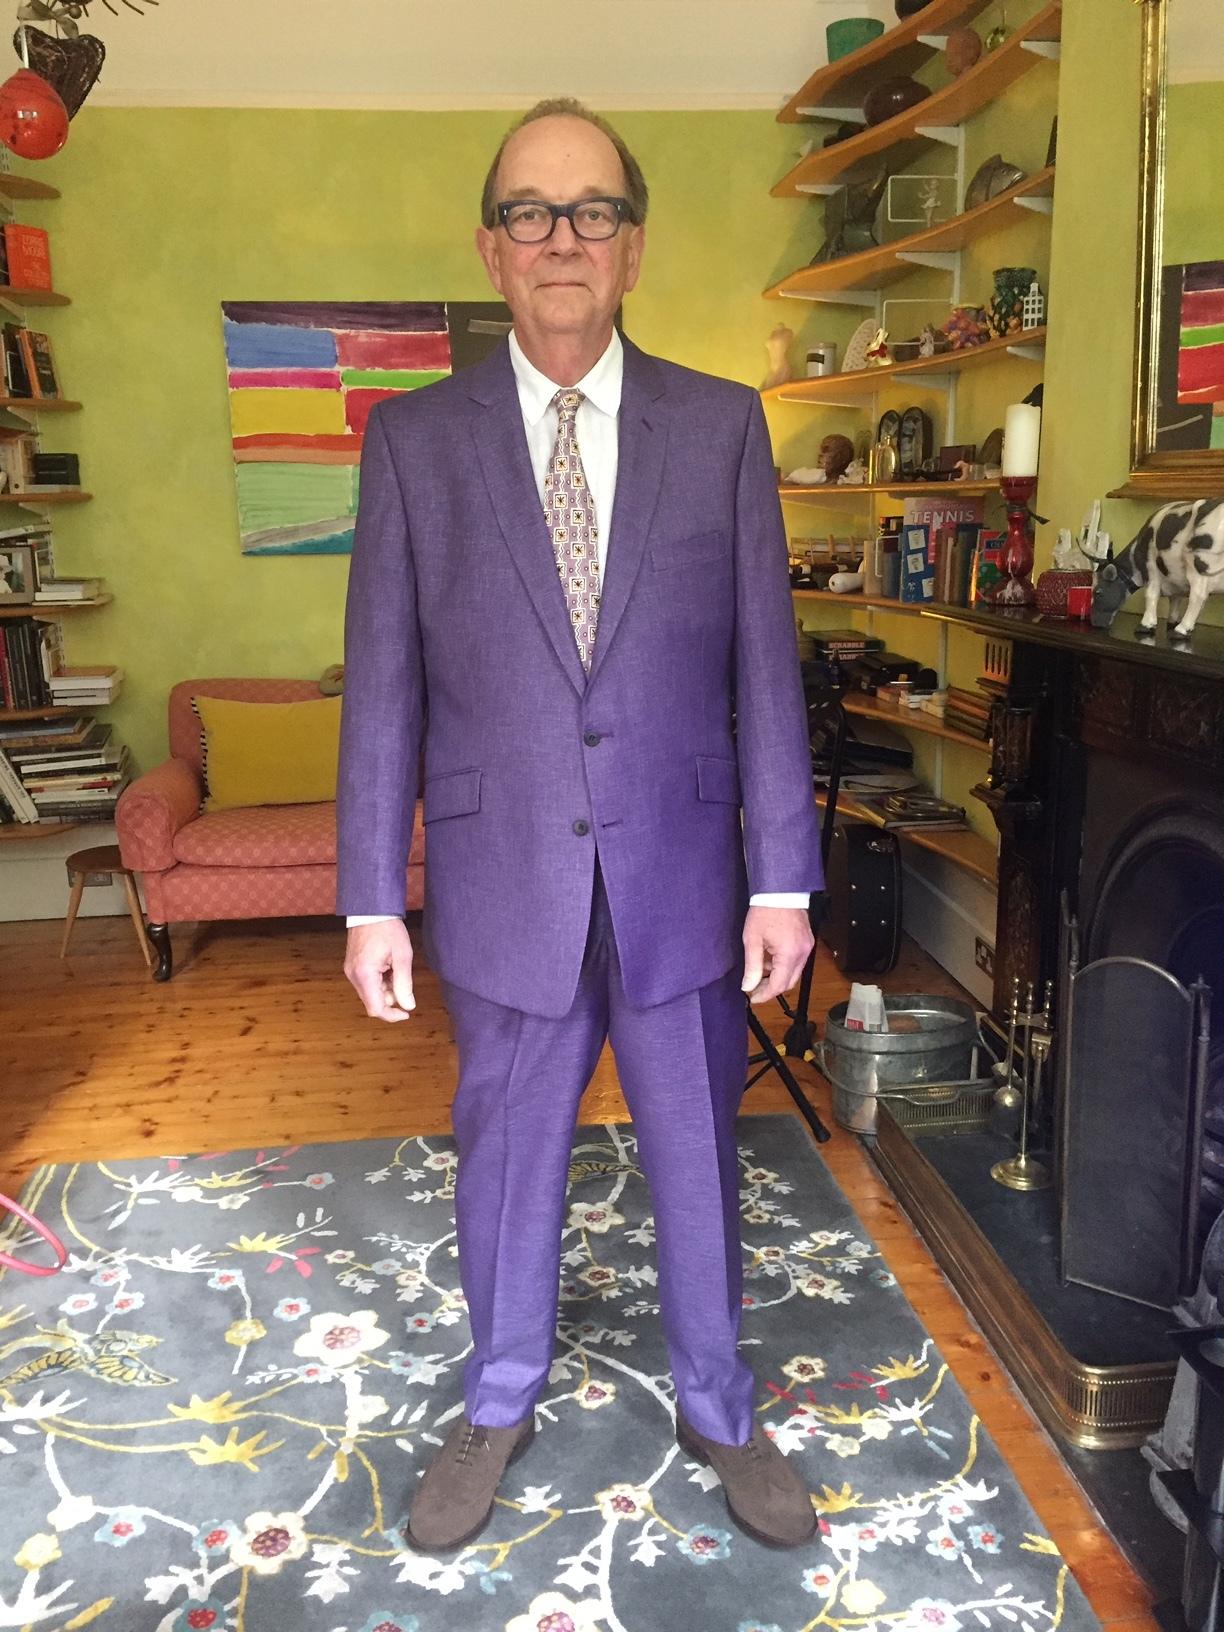 susannah-hall-tailor-made-britain-uk-dormeuil-bespoke-suit.JPG